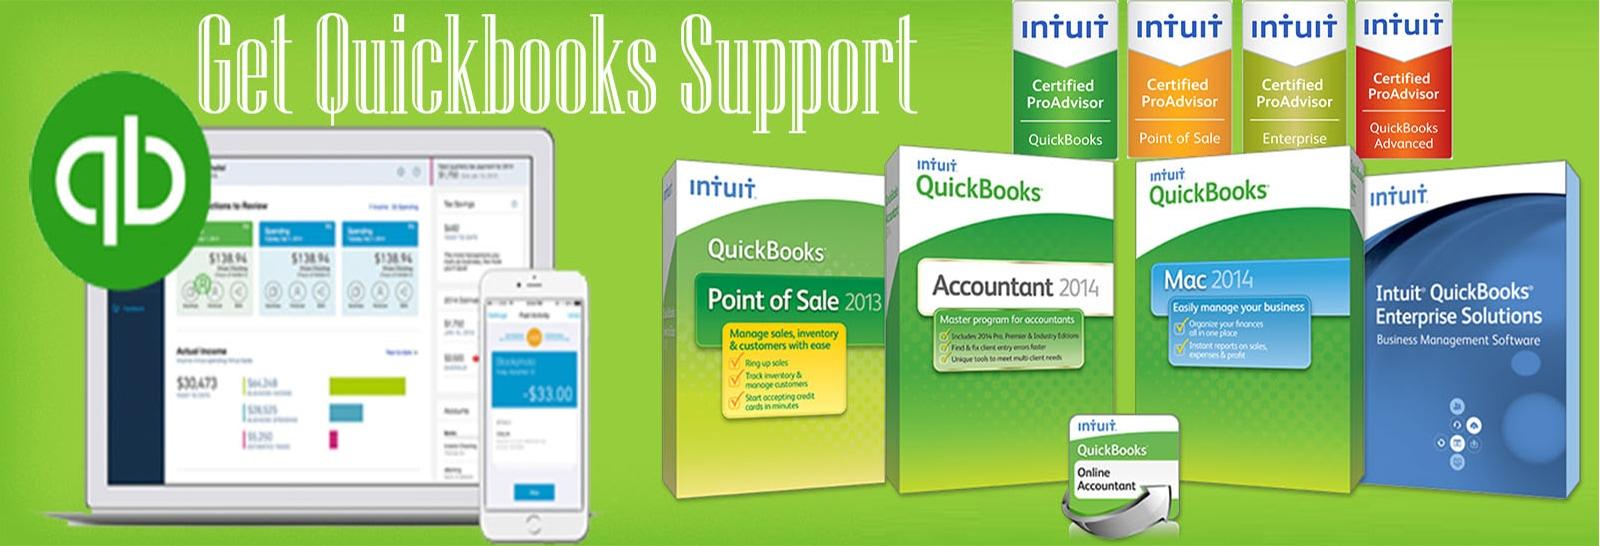 QuickBooks Enterprise Support Phone Number, Latest News Adda